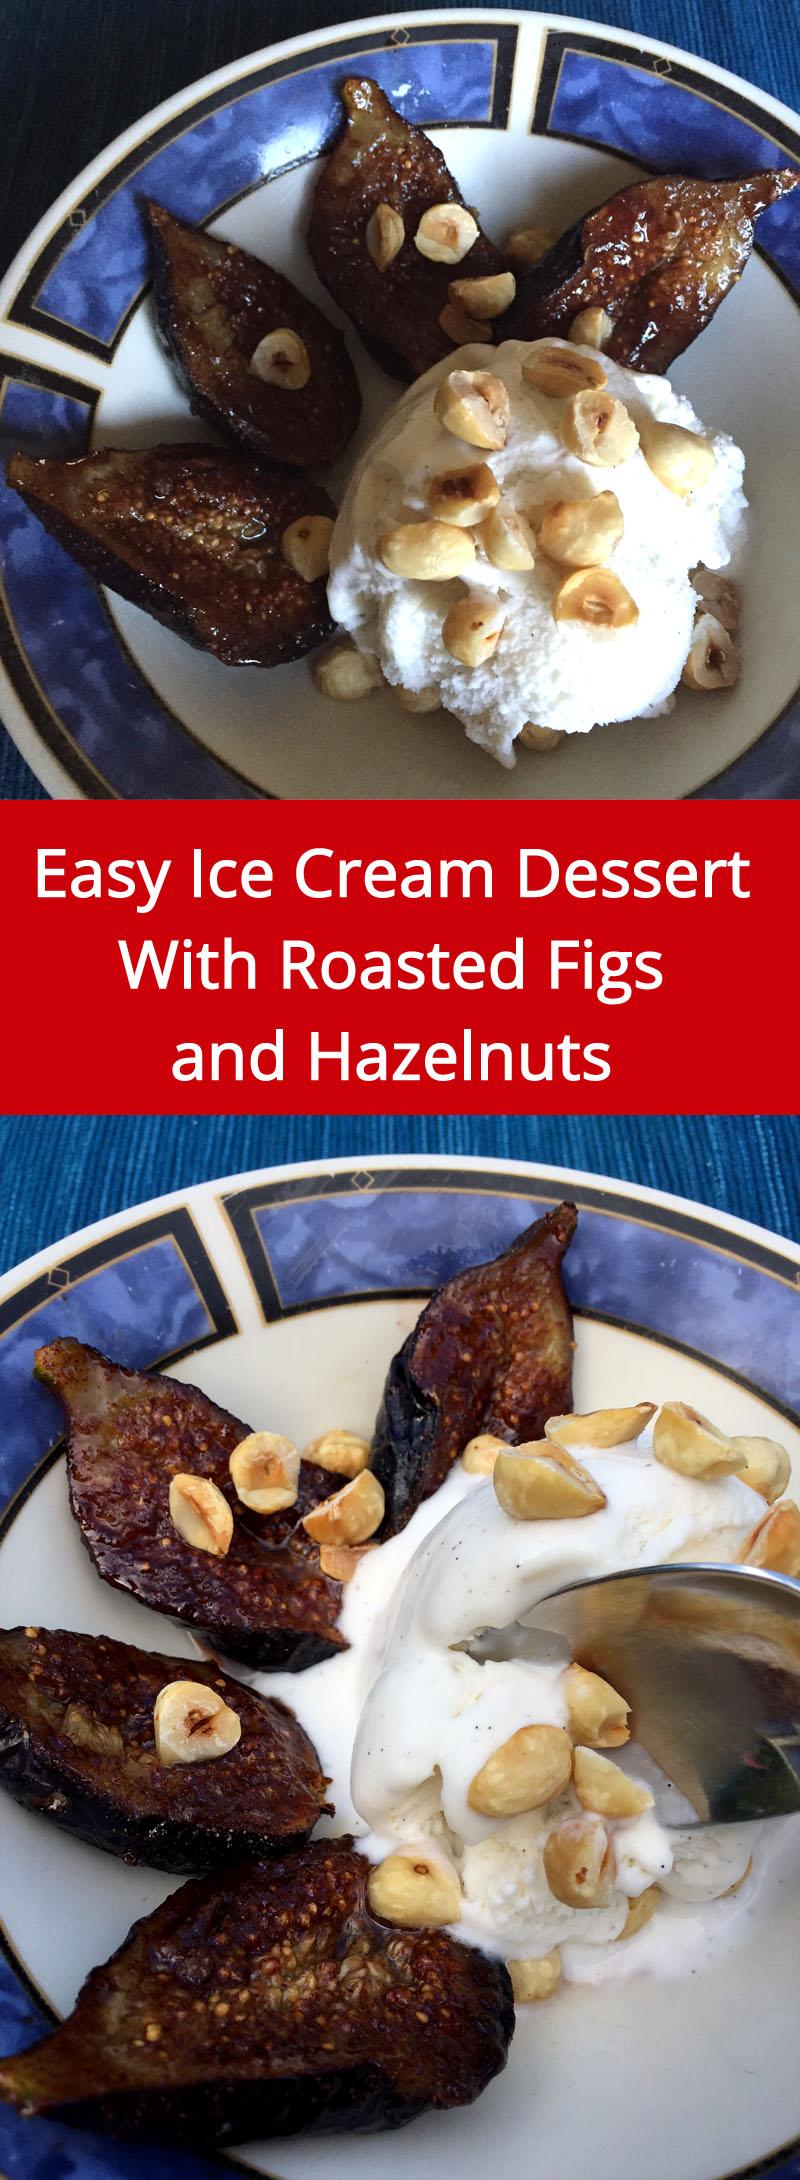 Ice Cream Dessert With Roasted Figs And Hazelnuts | MelanieCooks.com